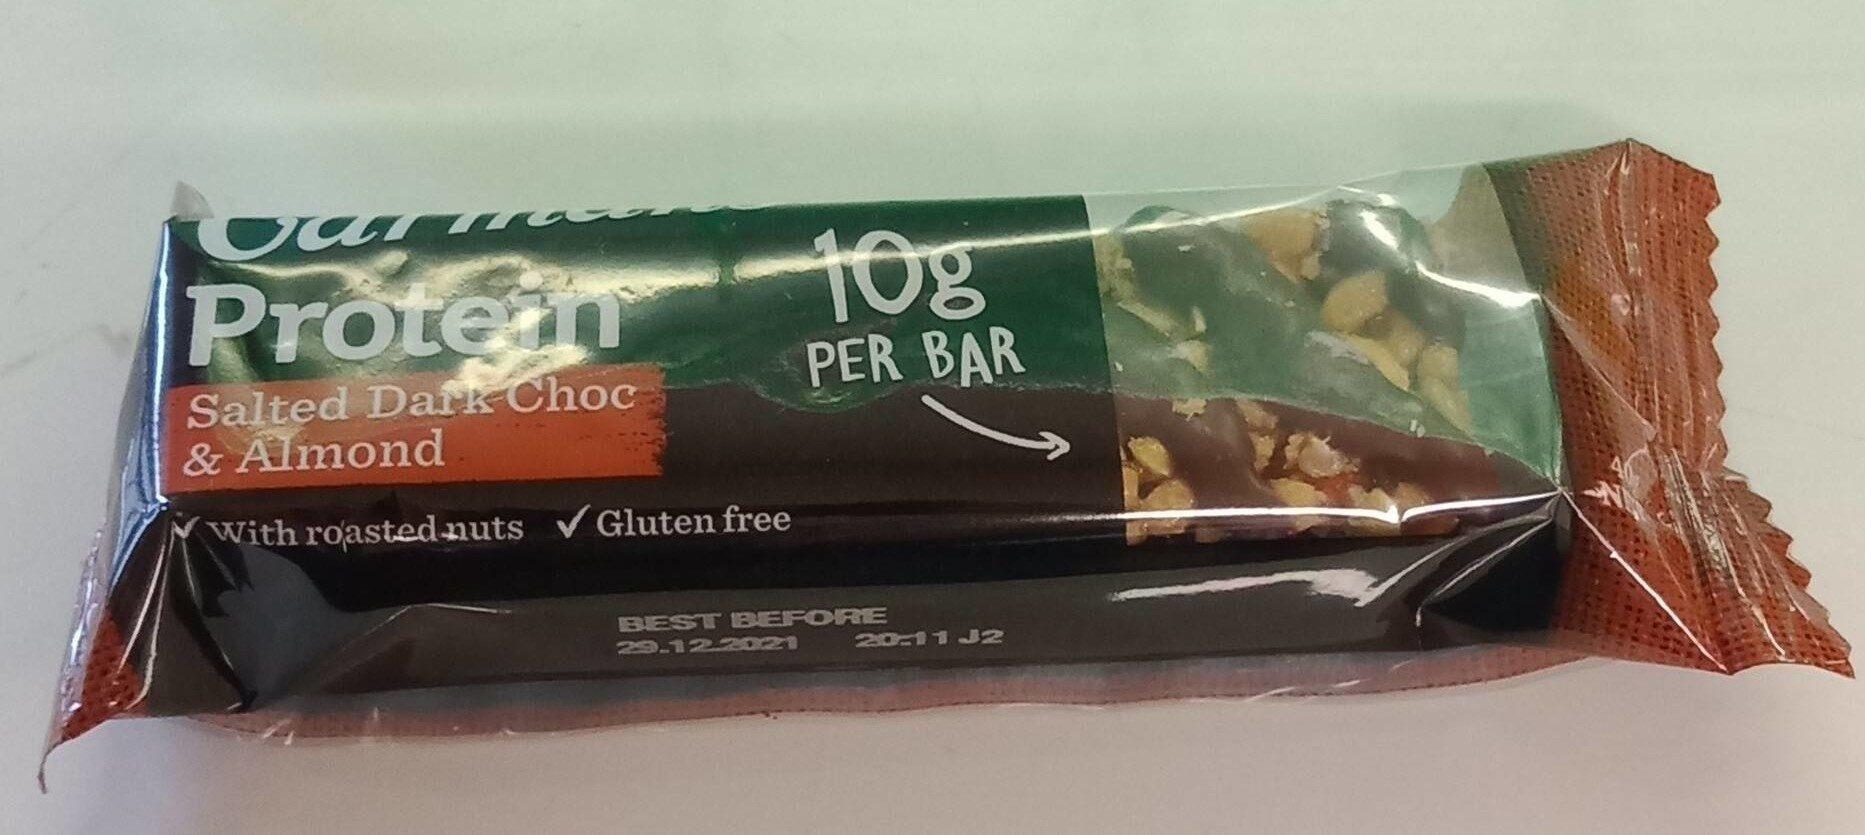 Protein bar - Product - en